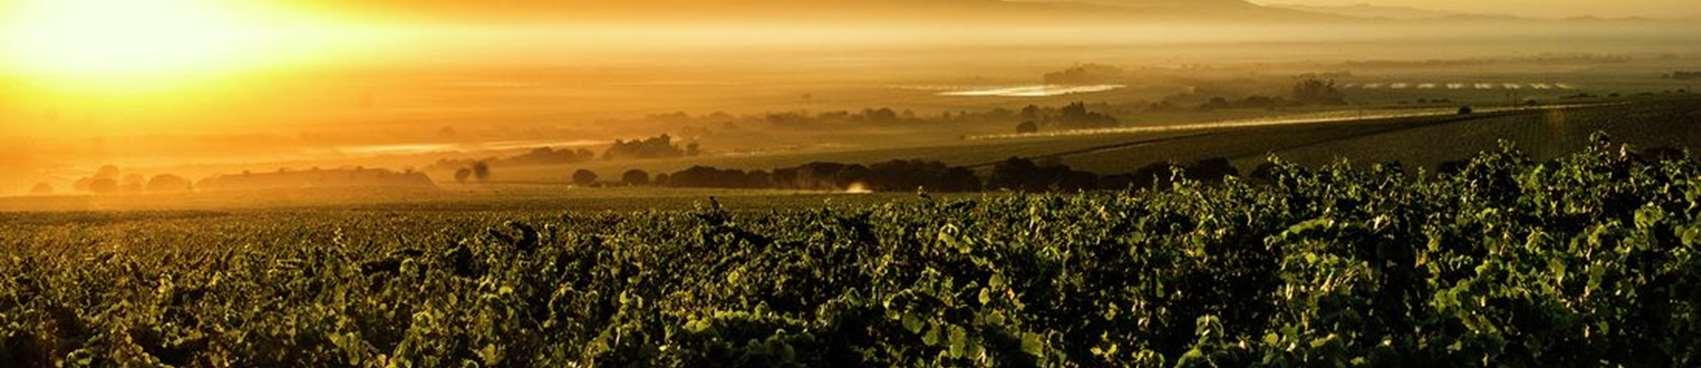 A image of Talbott Vineyards